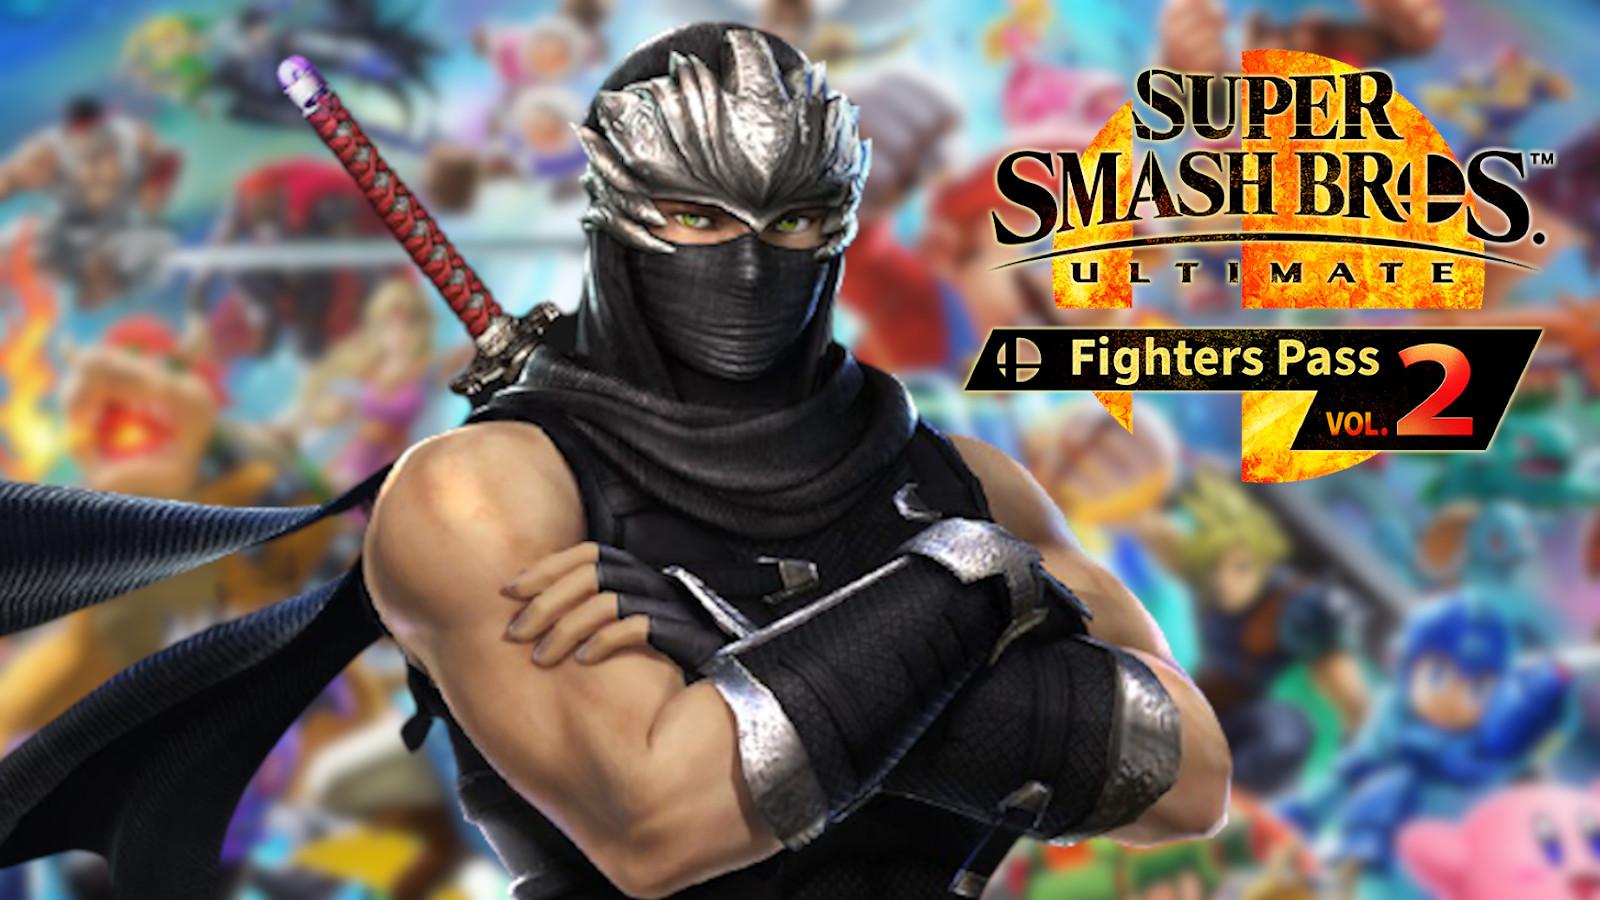 Ninja Gaiden's Ryu Hayabusa in Smash Ultimate